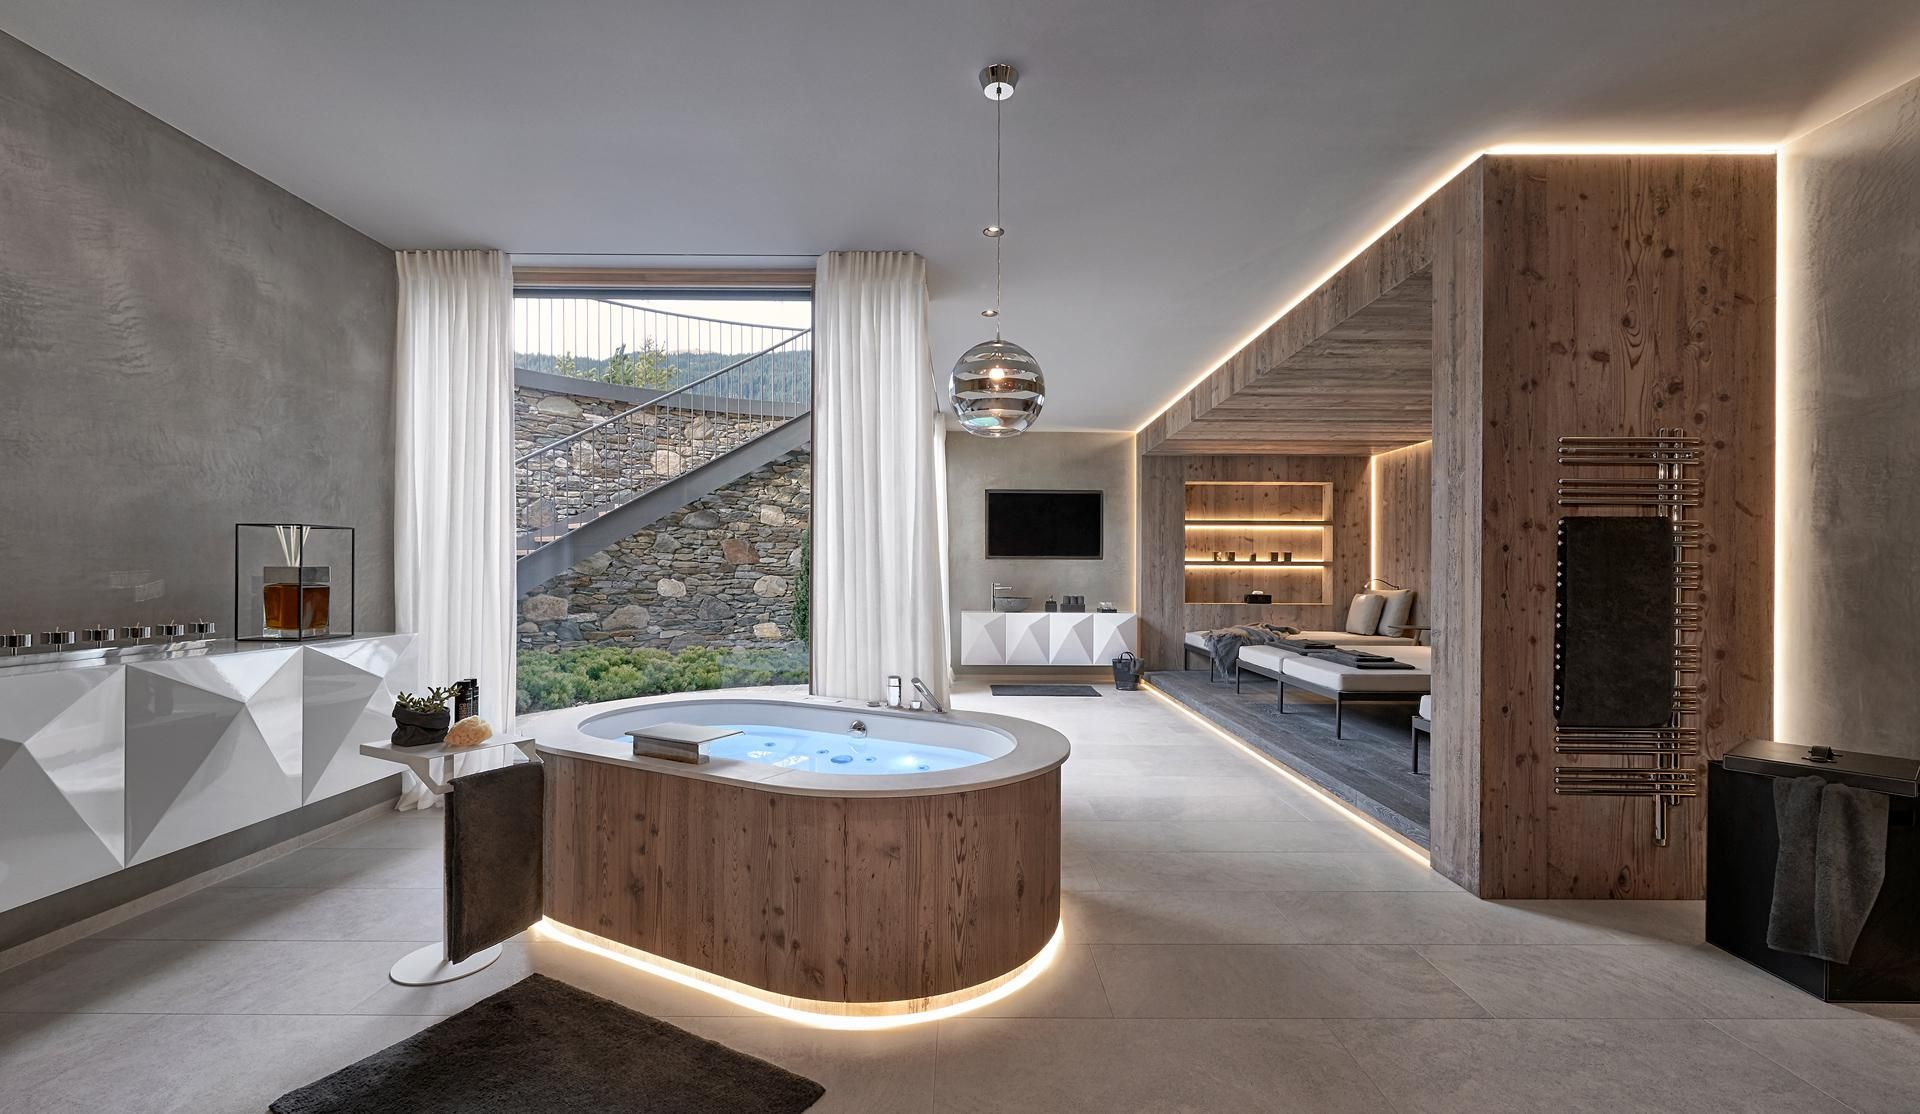 Gasteiger Bad Kitzbuhel Wellness Sauna Dampfbad Schwimmbad Whirlpool Spa Rooms Bathroom Spa Stylish Bathroom